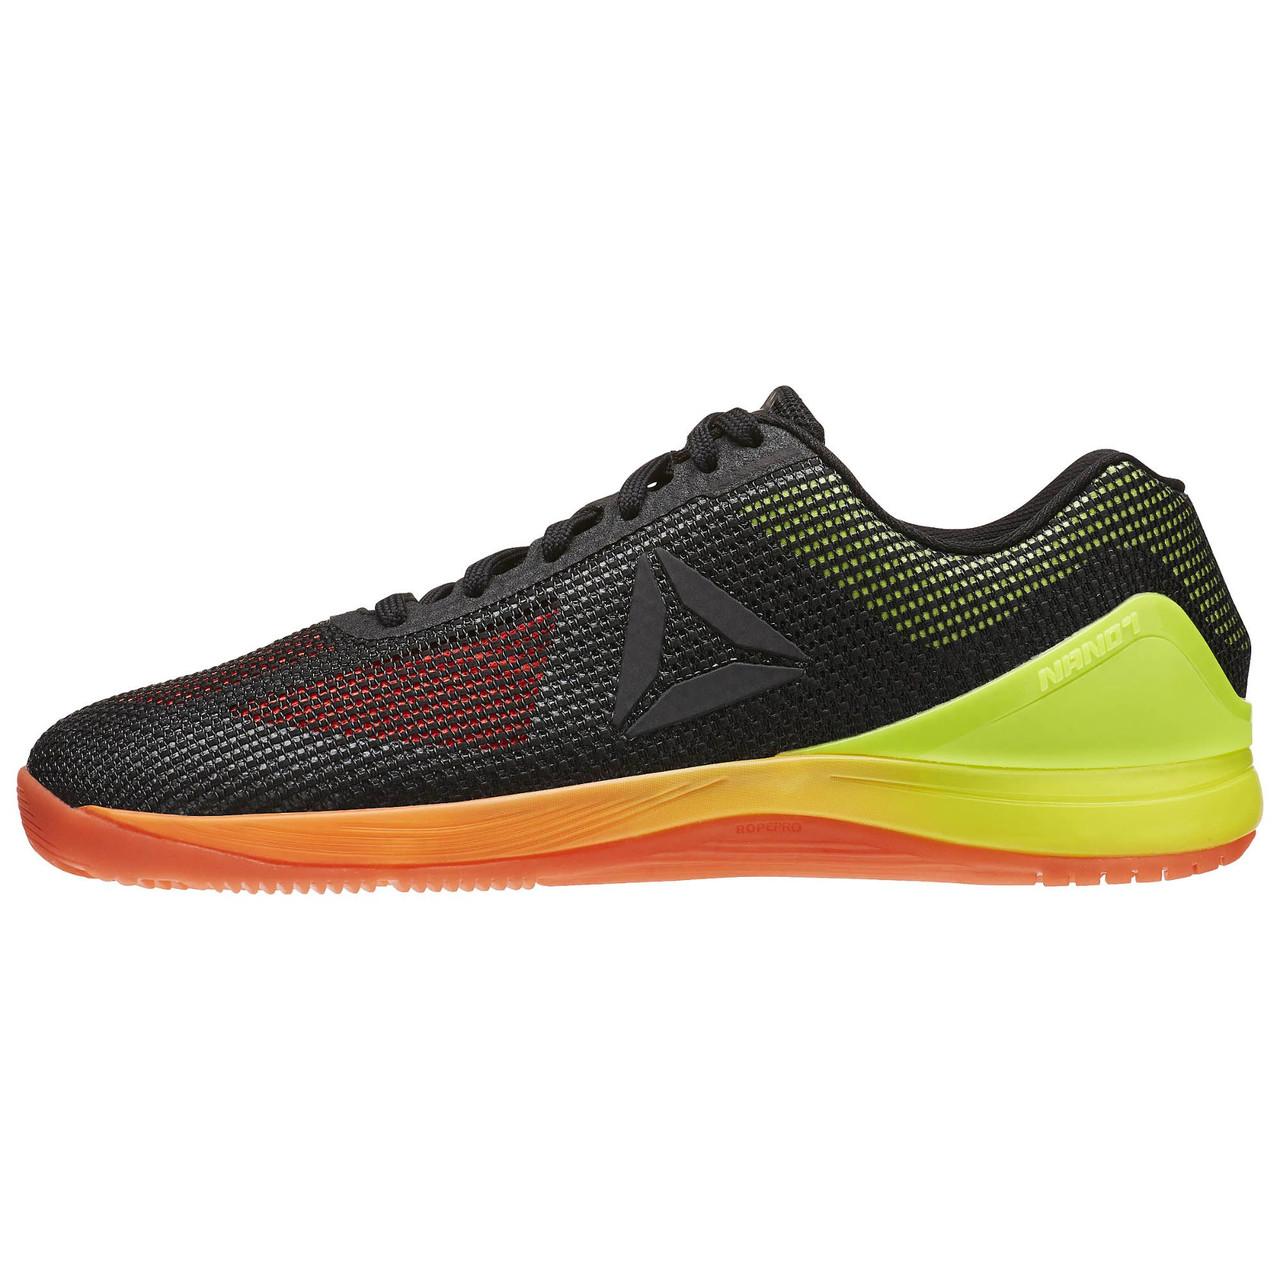 f46dfa229291 Купить Мужские кроссовки Reebok Crossfit Nano 7.0 (Артикул  BD2829 ...